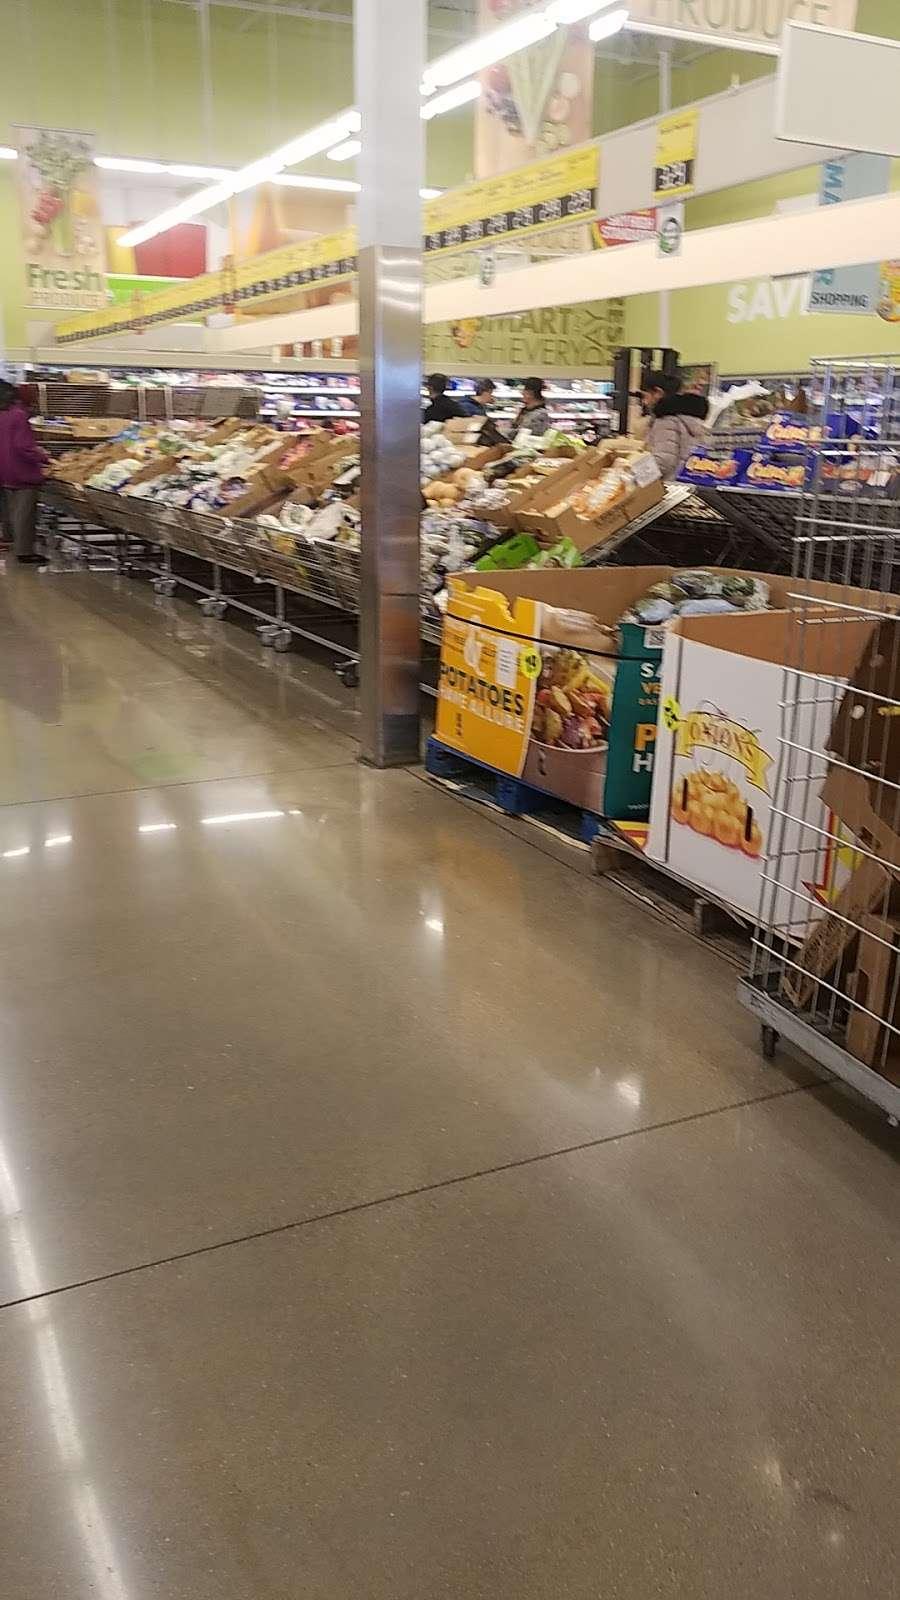 ALDI - supermarket  | Photo 7 of 10 | Address: 1038 N Rohlwing Rd, Addison, IL 60101, USA | Phone: (855) 955-2534